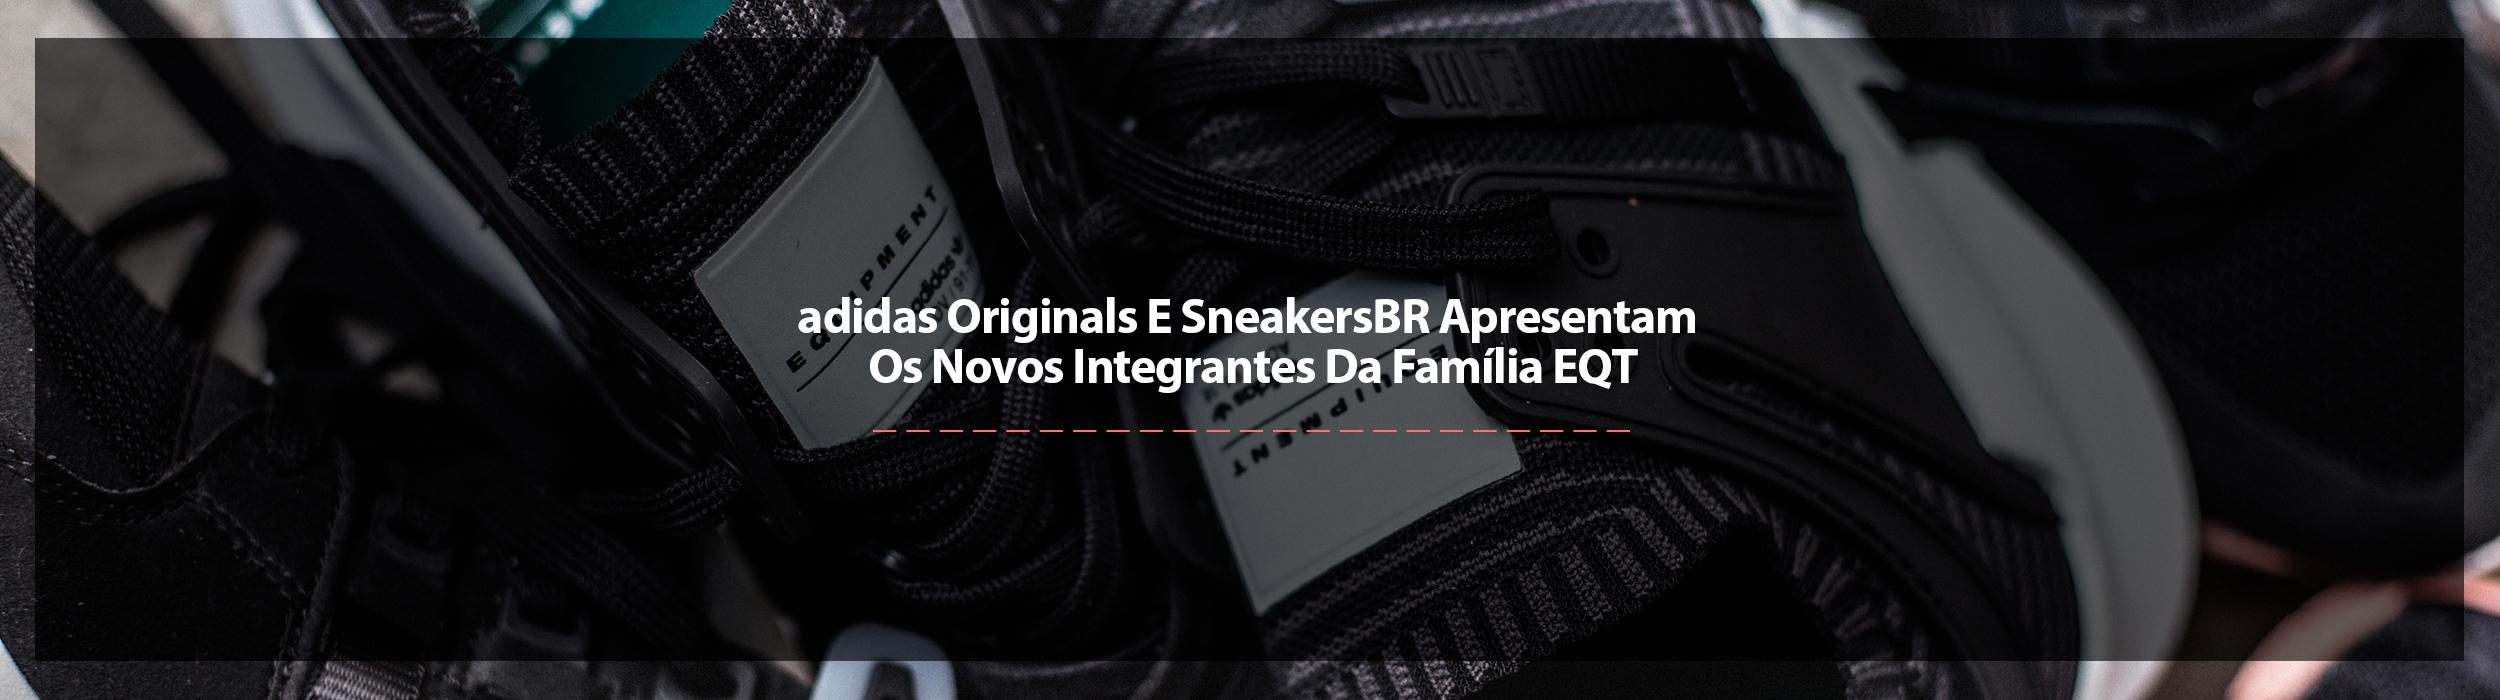 adidas-EQT-banner1